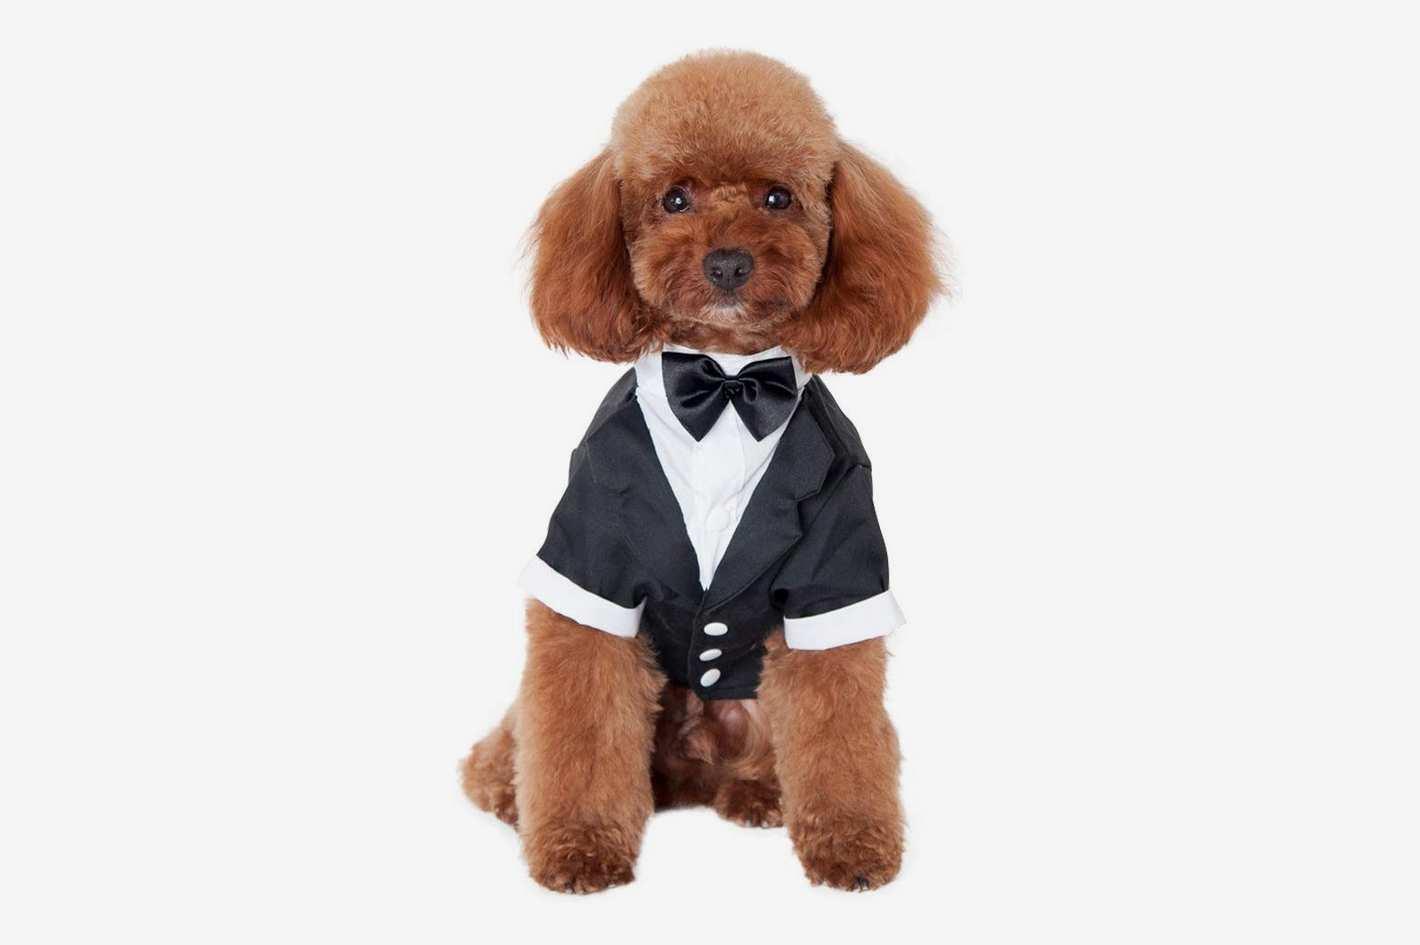 Kuoser Dog Shirt Puppy Pet Small Dog Clothes